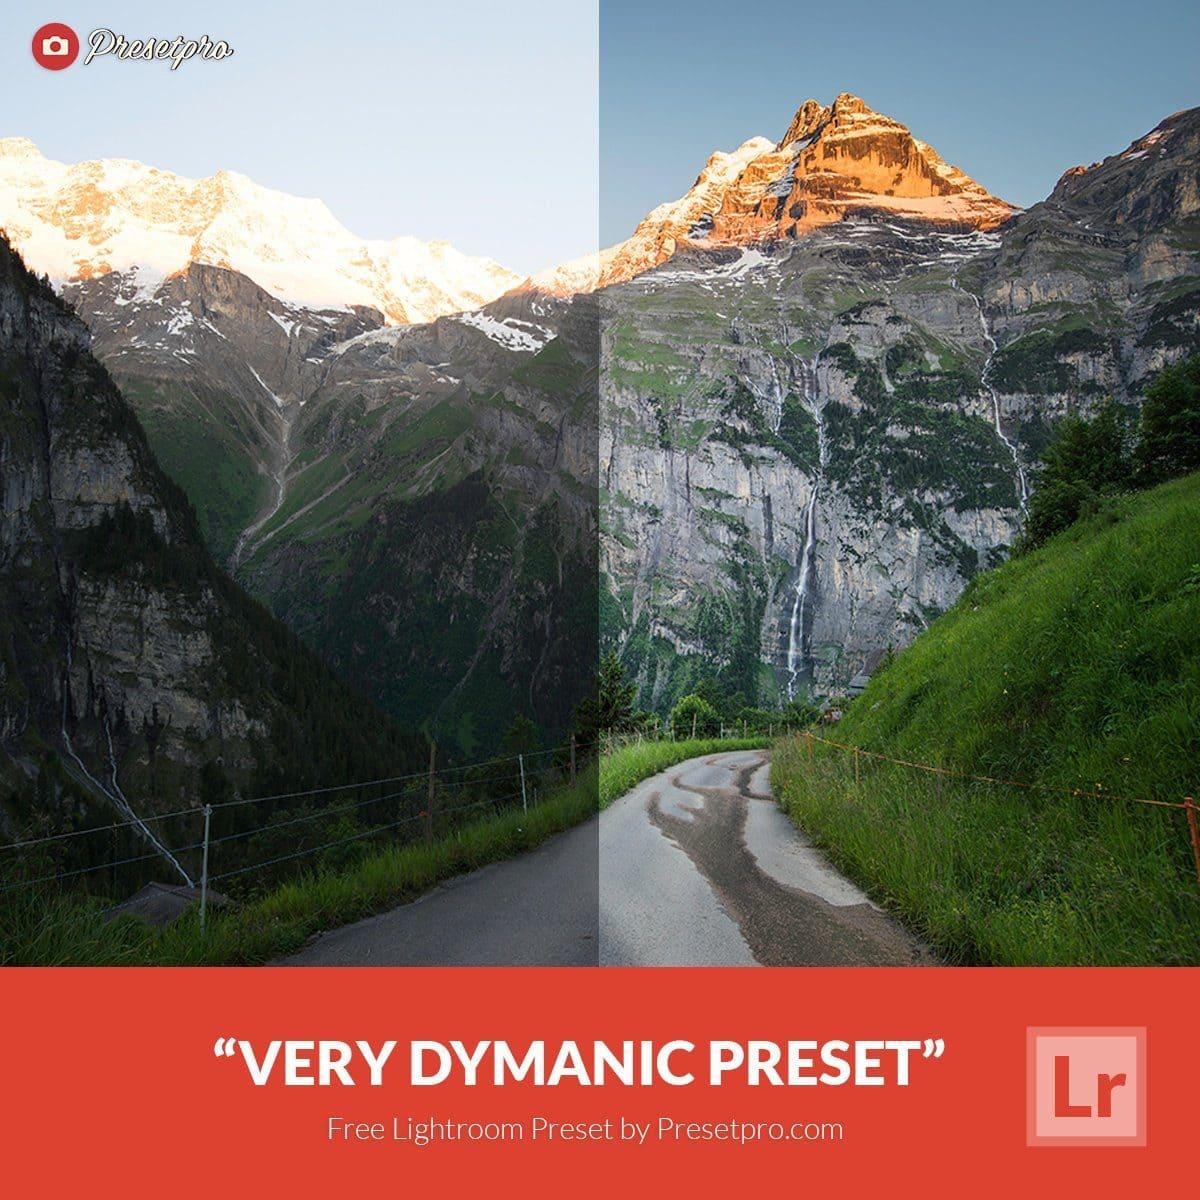 Free-Lightroom-Preset-Very-Dynamic